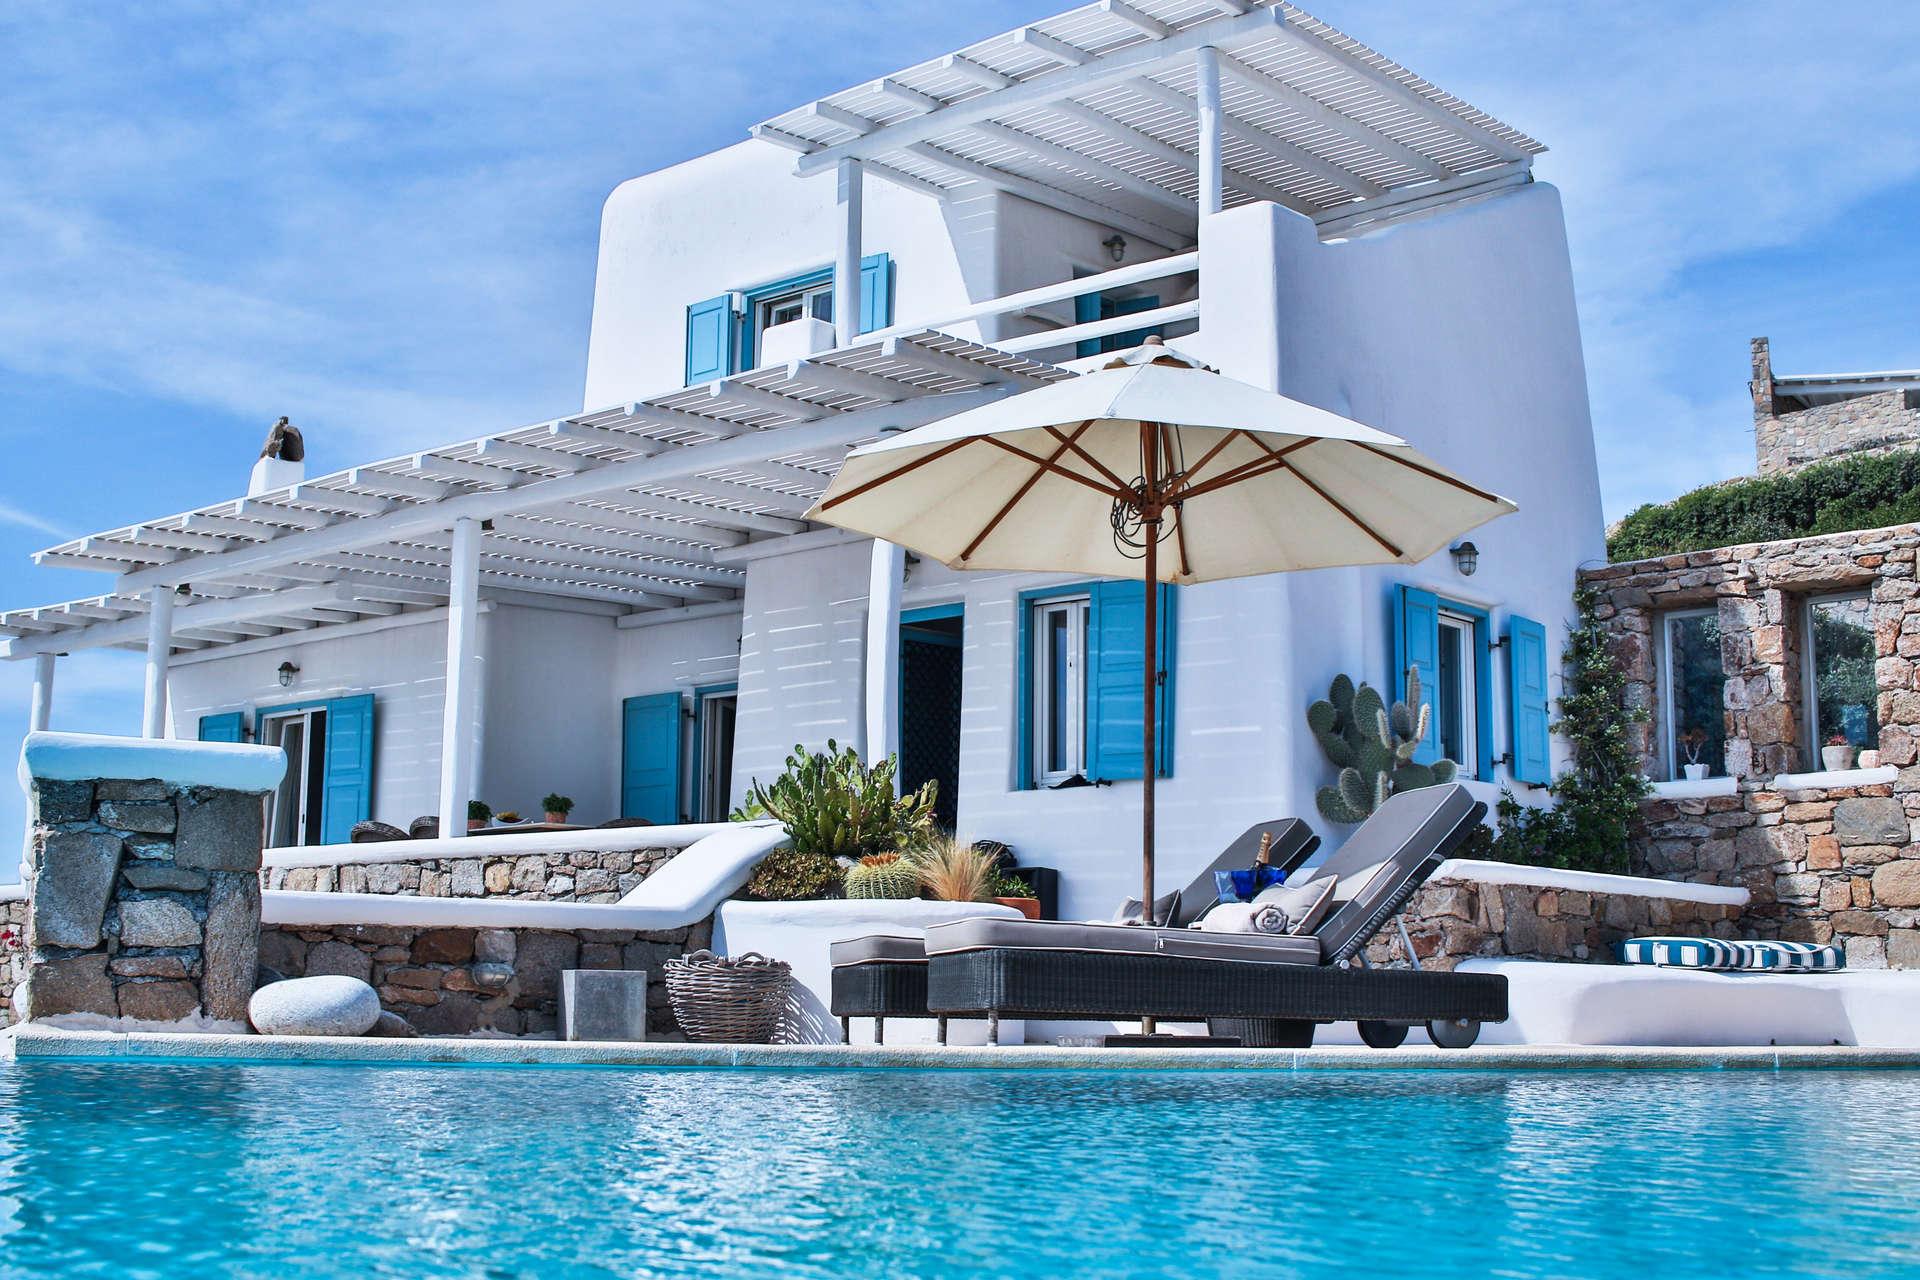 Luxury vacation rentals europe - Greece - Mykonos - Faros armenistis - Villa Sunshine | Mykonos - Image 1/31